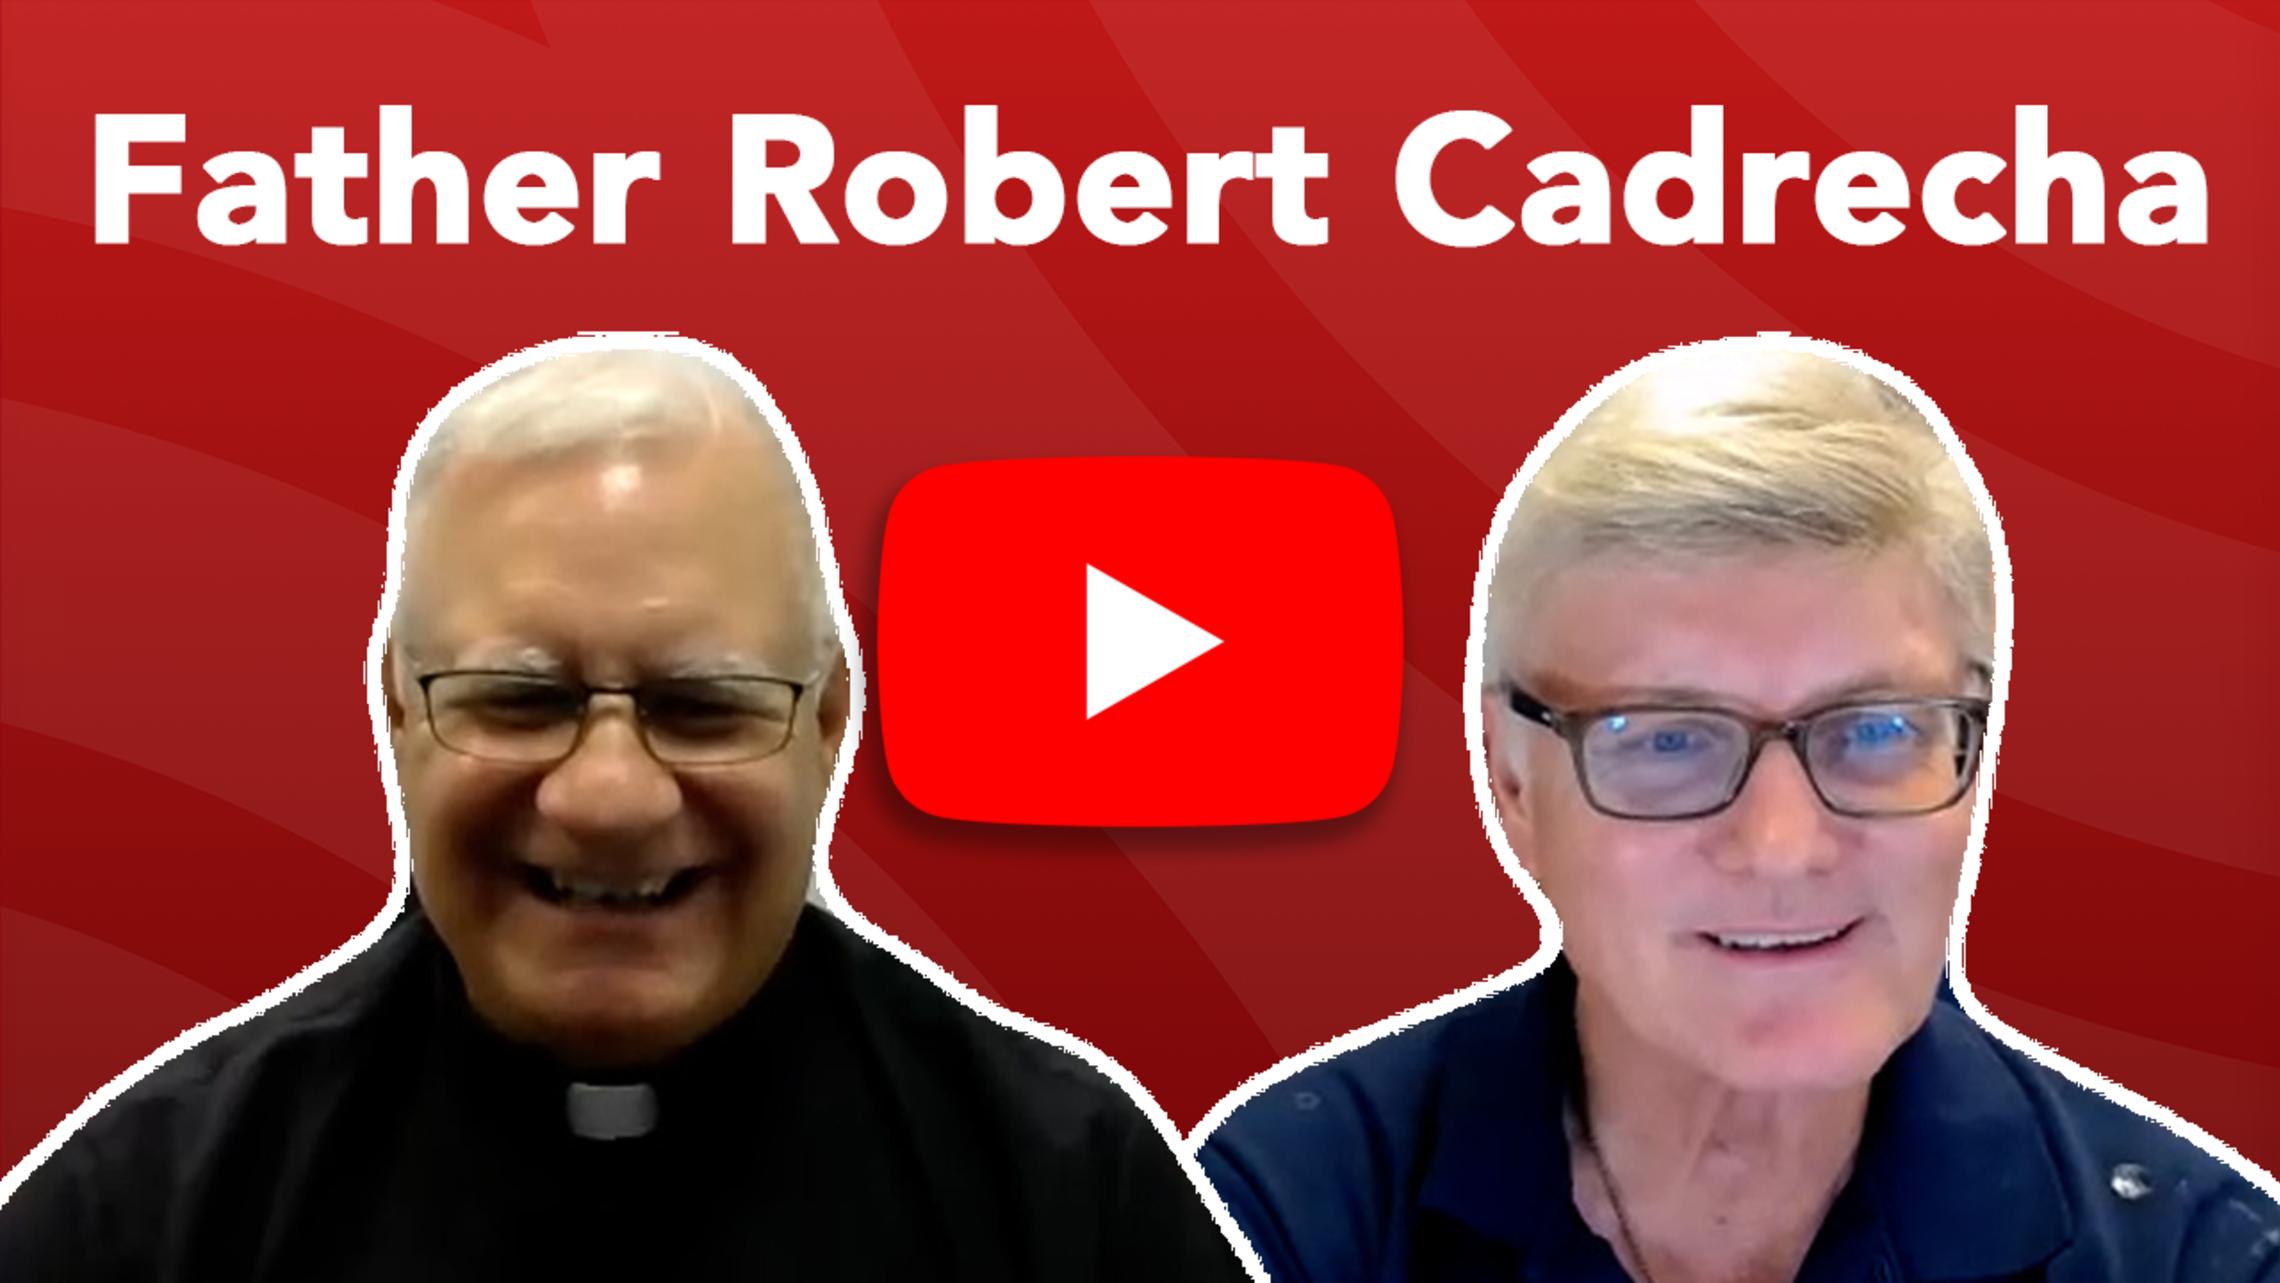 Father Robert Cadrecha Tn Website